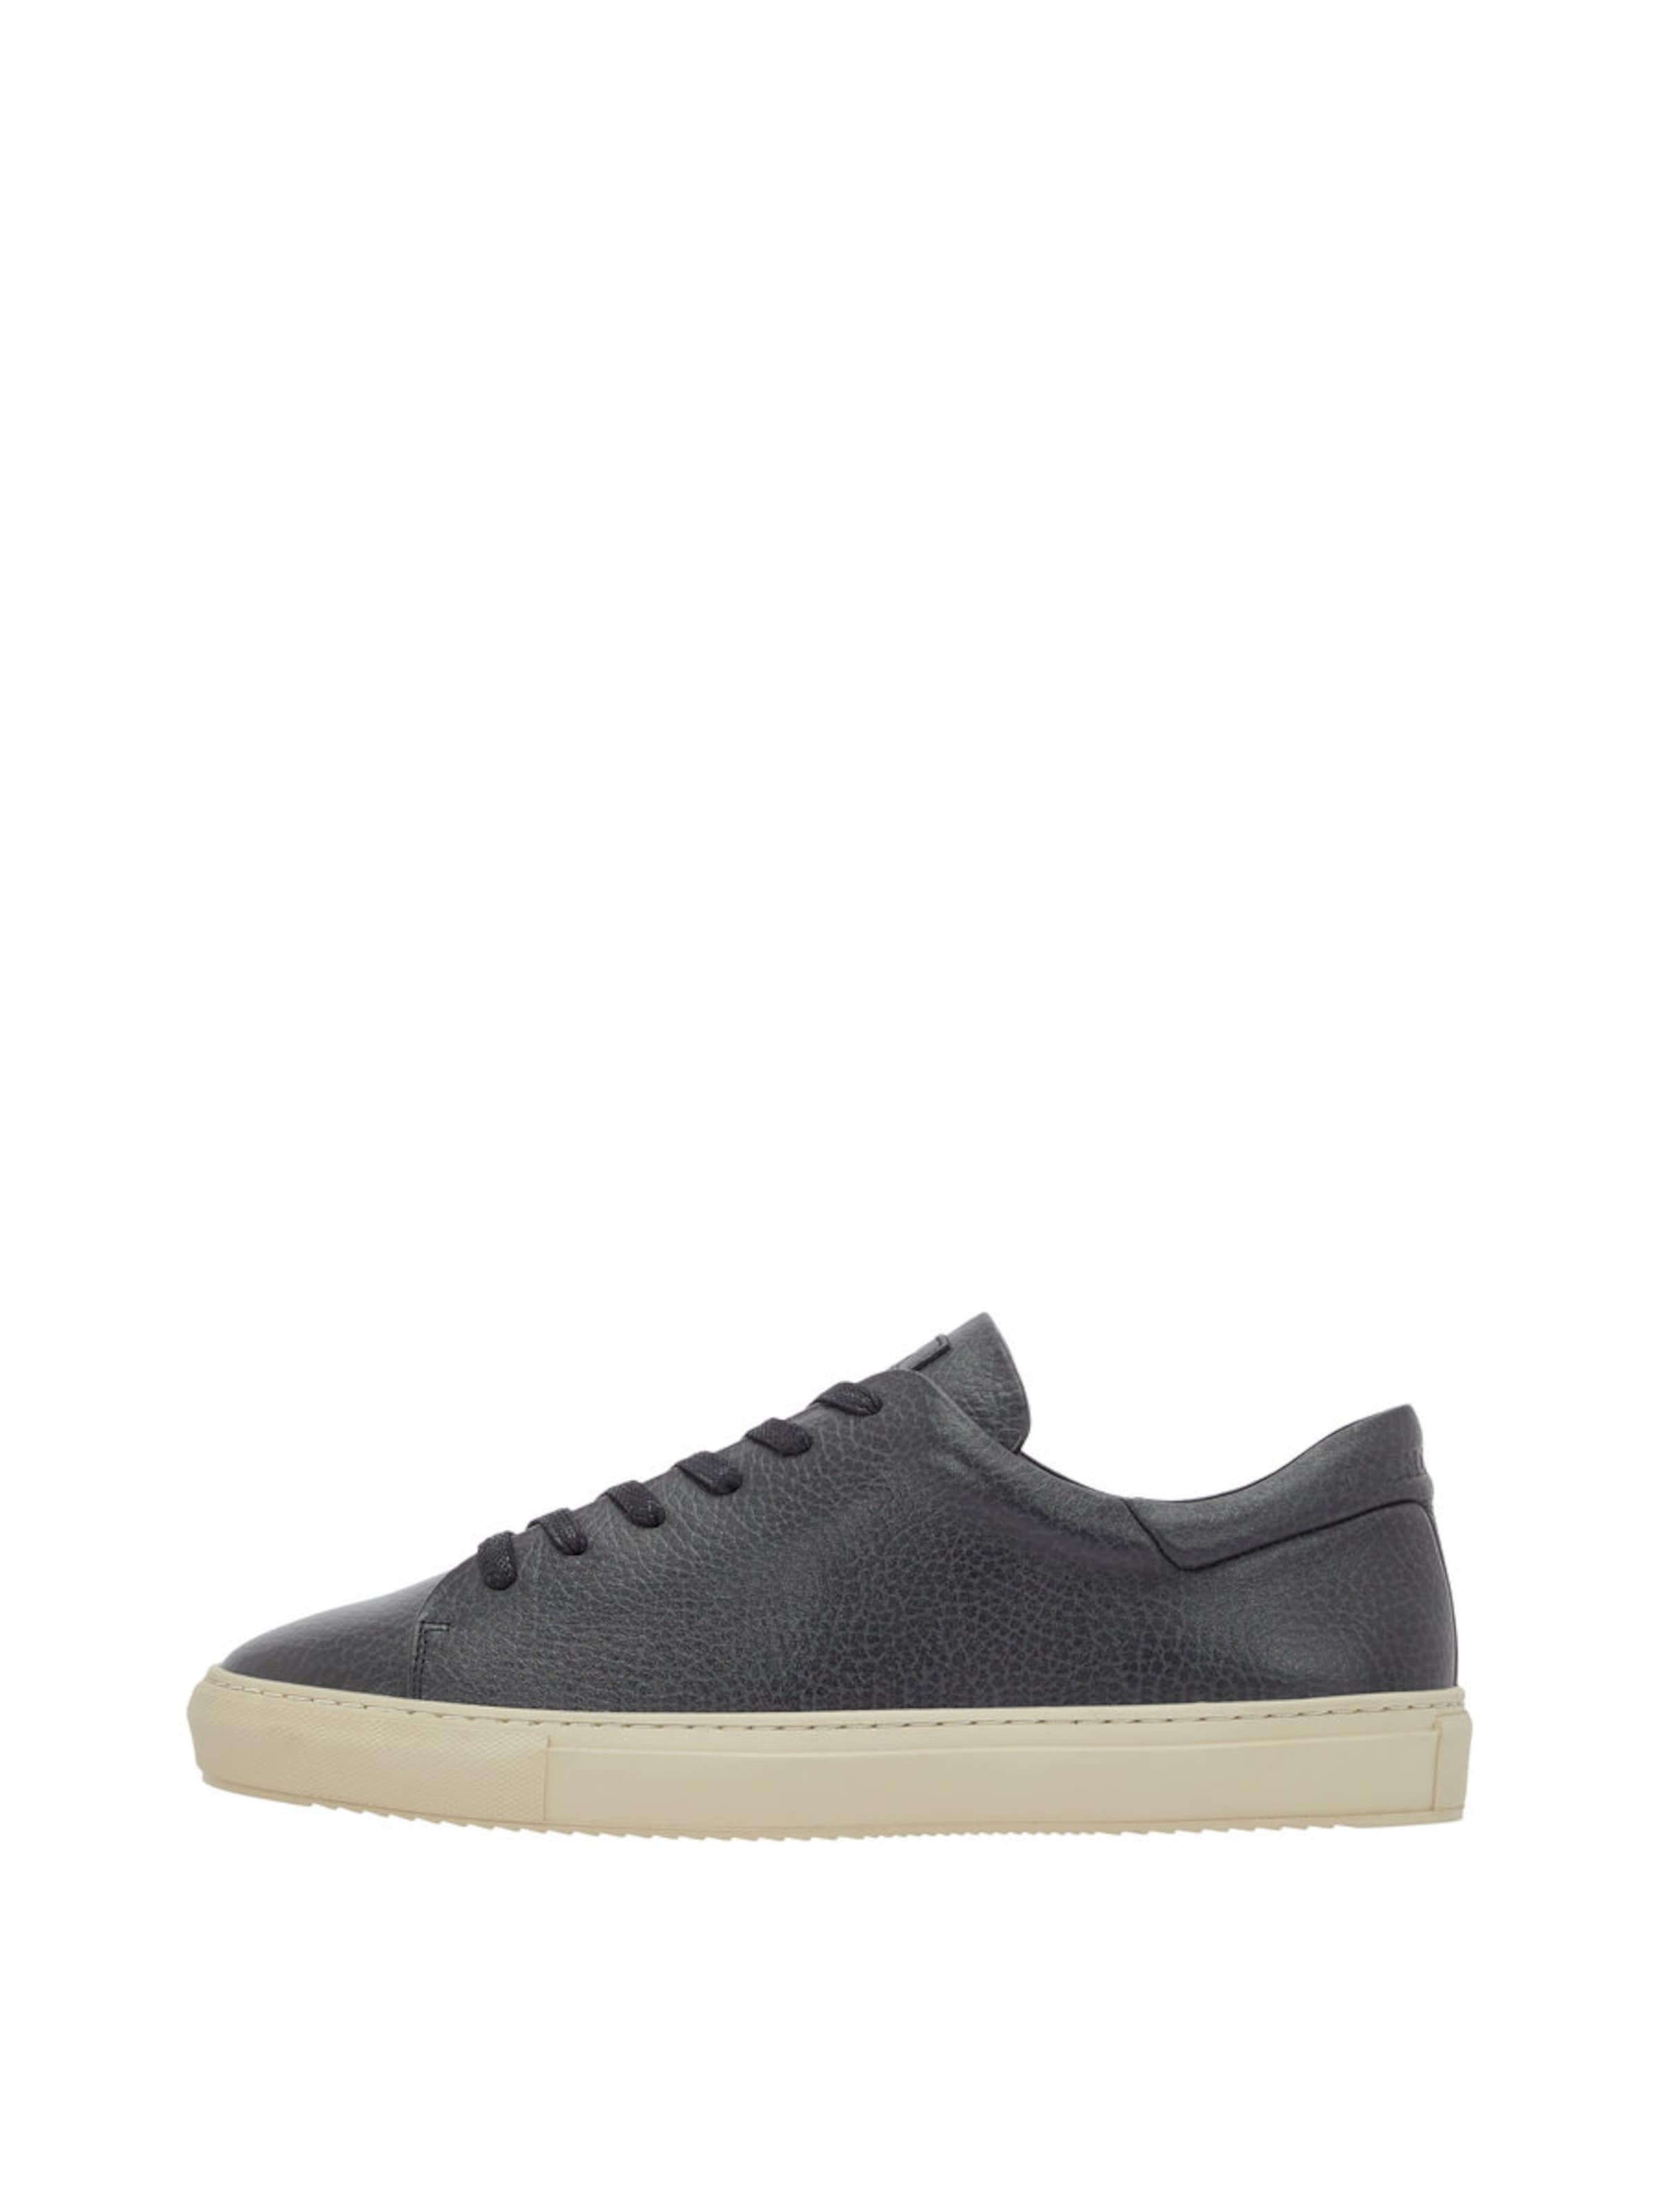 J.Lindeberg Lot Leather Grain Sneaker